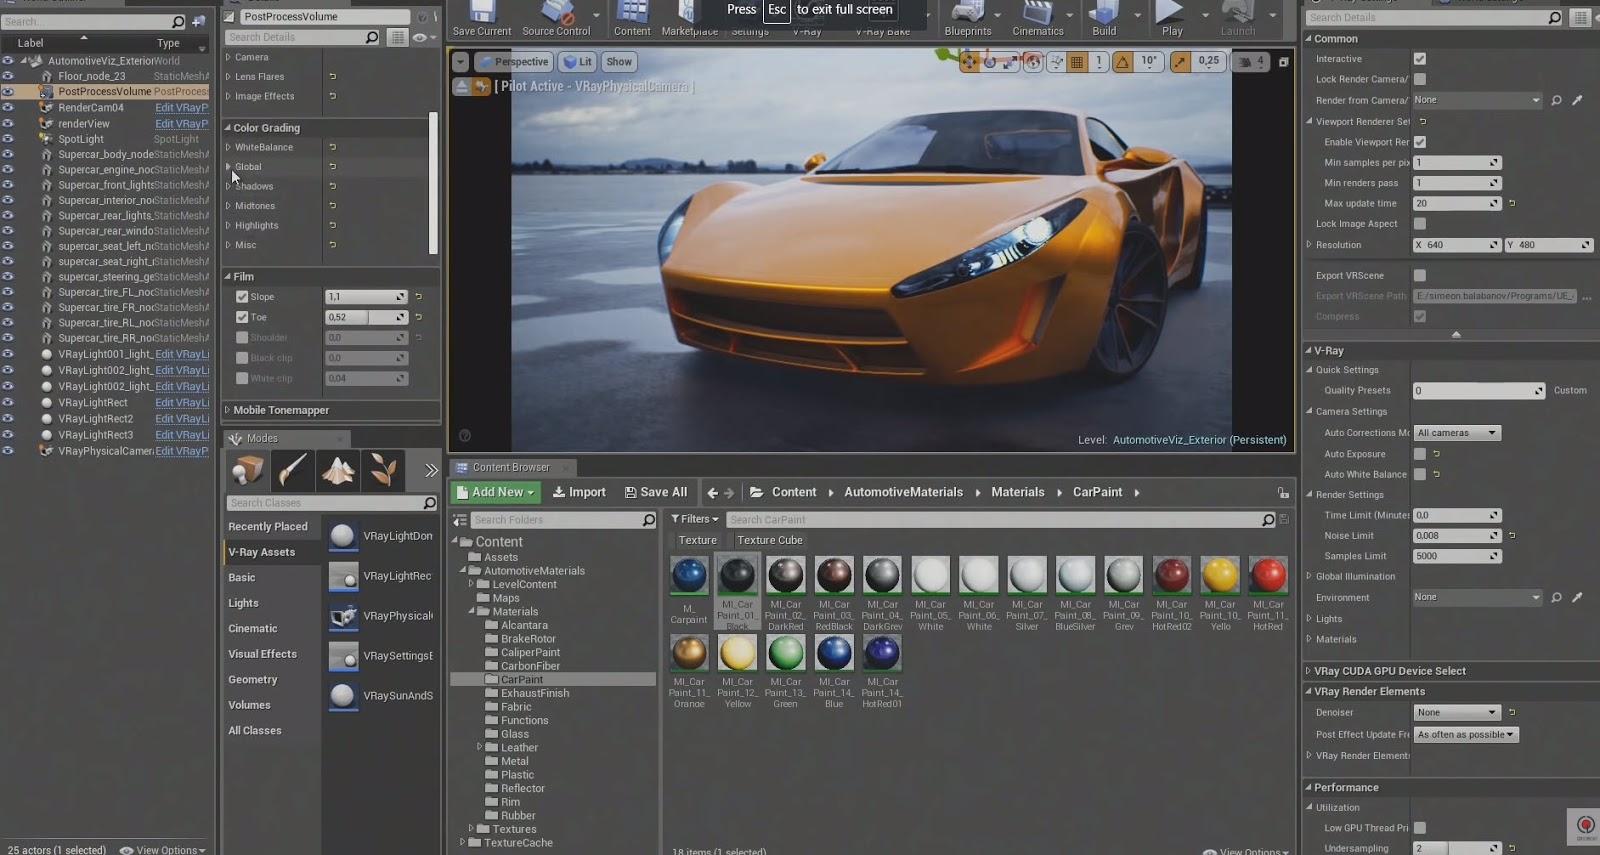 V-Ray for Unreal - Viewport raytracing and Unreal materials